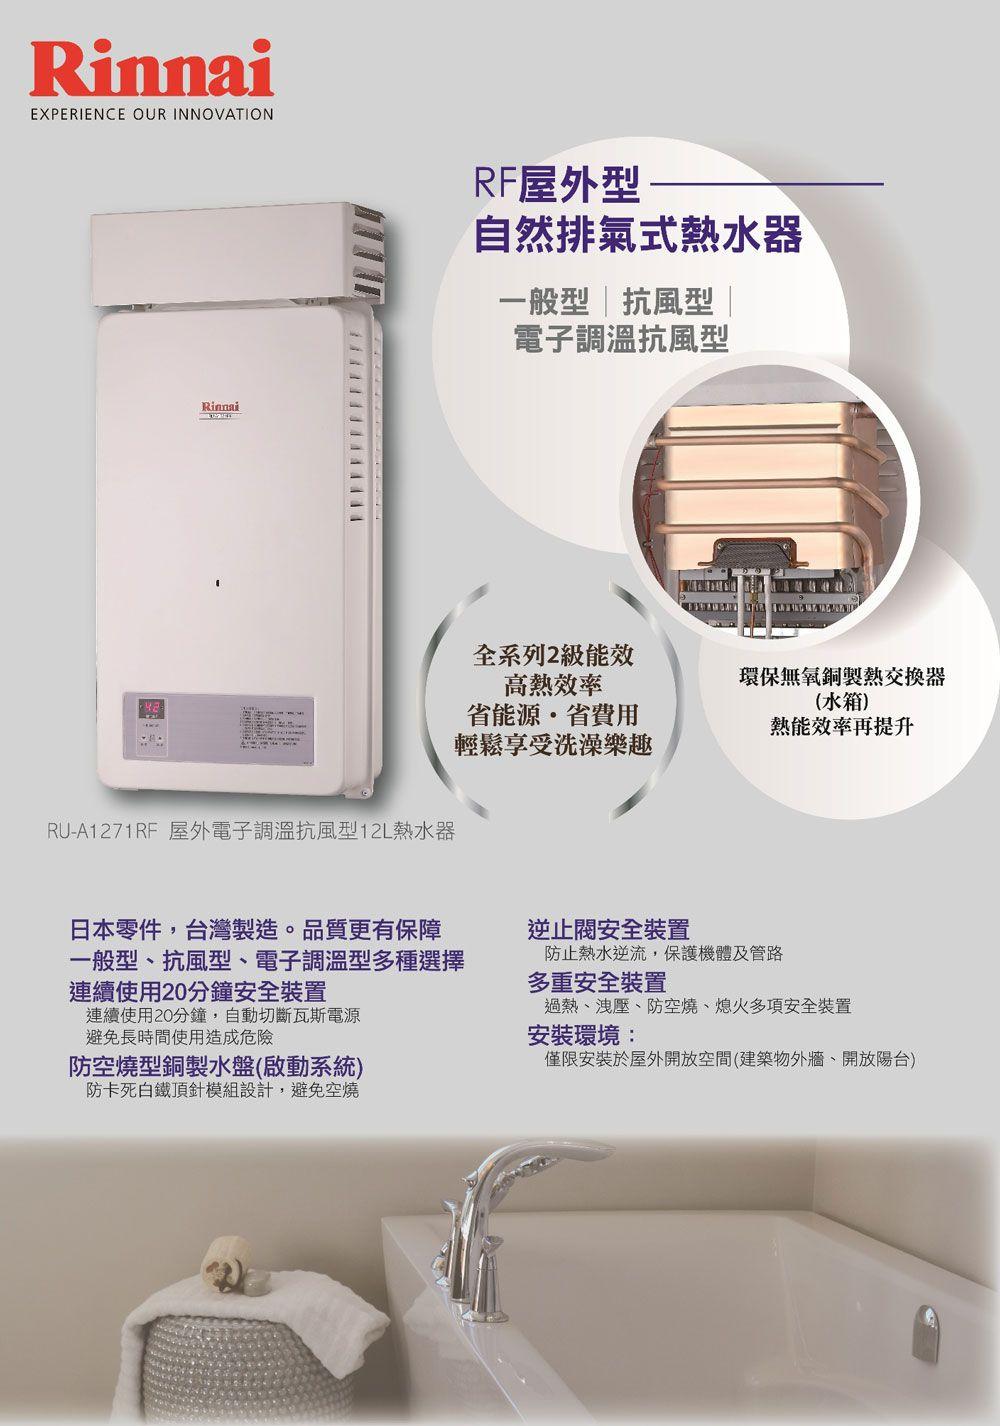 PK/goods/Rinnai/Water Heater/RU-A1021RF-DM-1.jpg